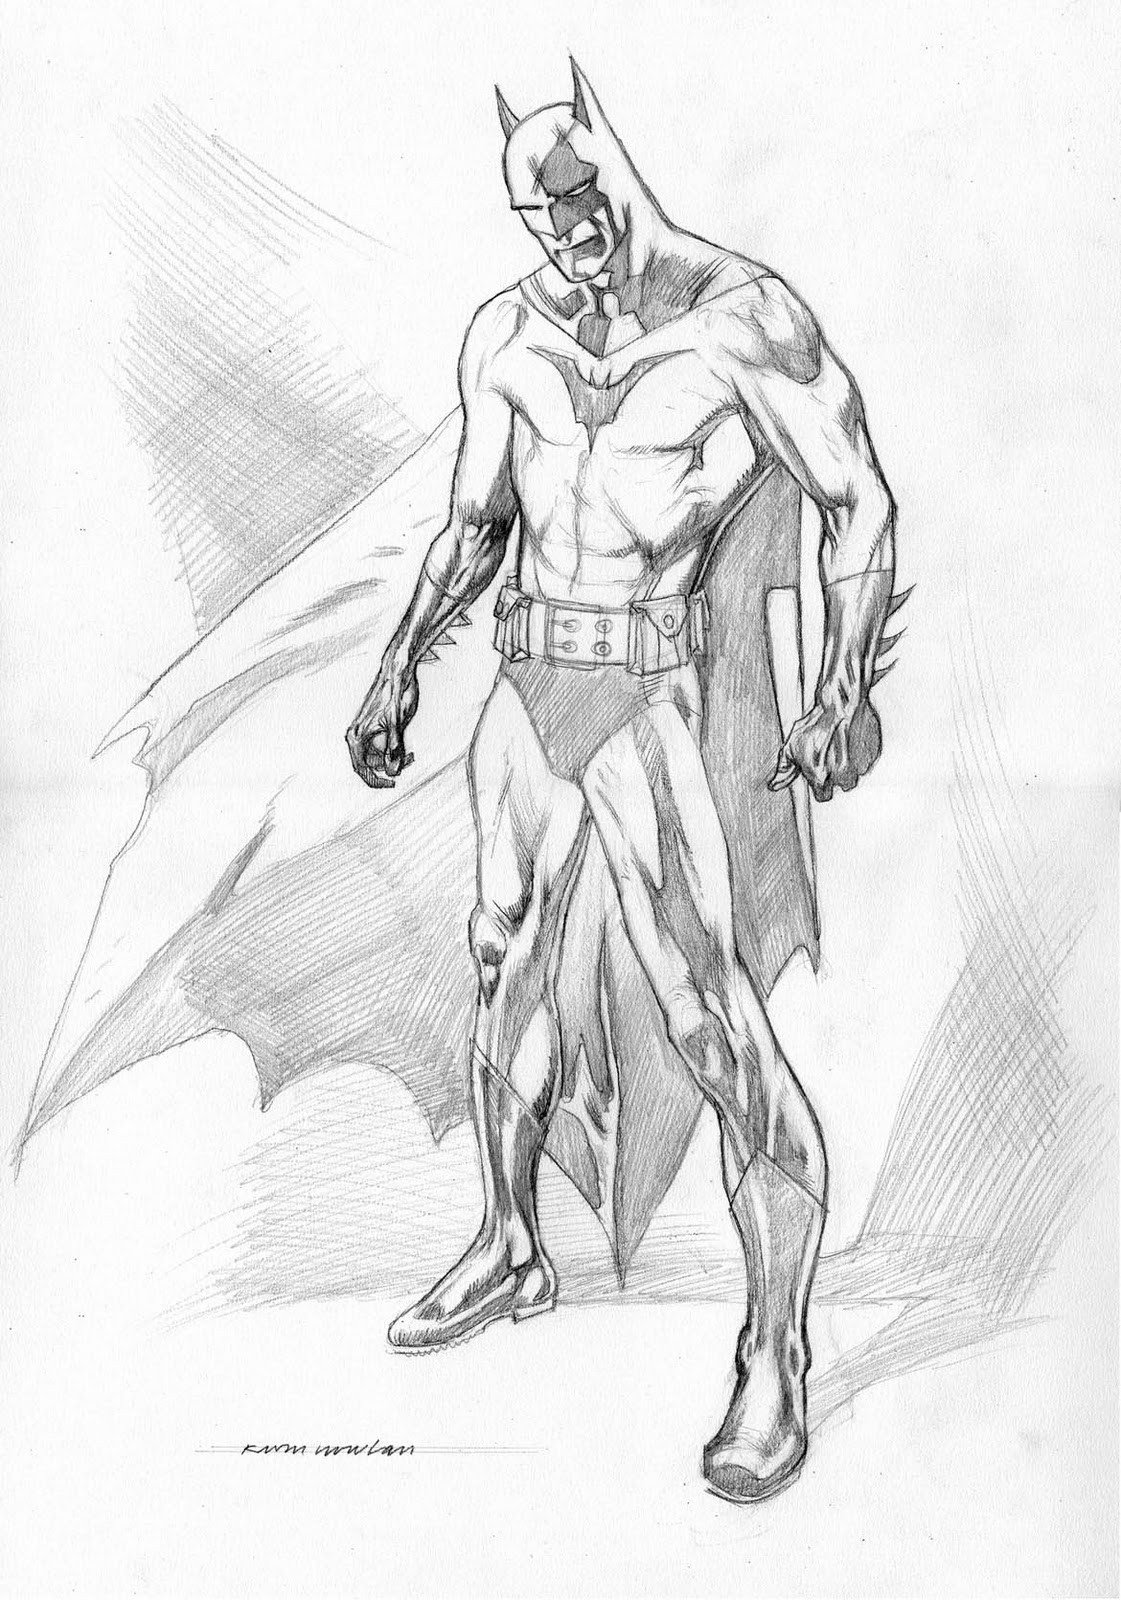 Batman Drawing In Pencil Kevin nowlan October 2010